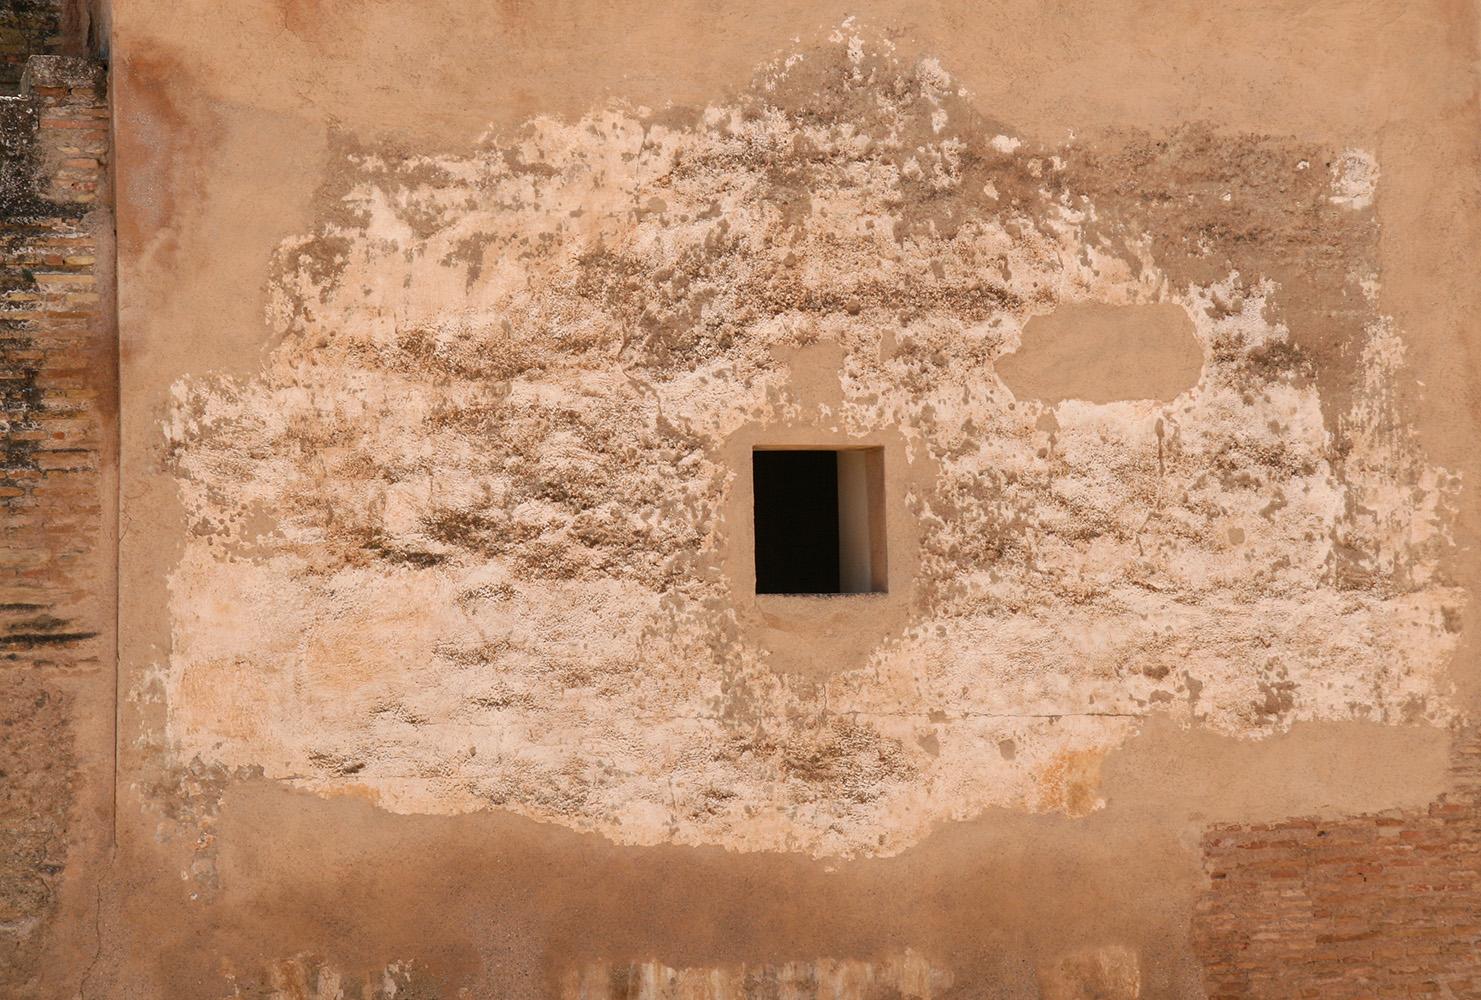 granada-wall-with-opening.JPG